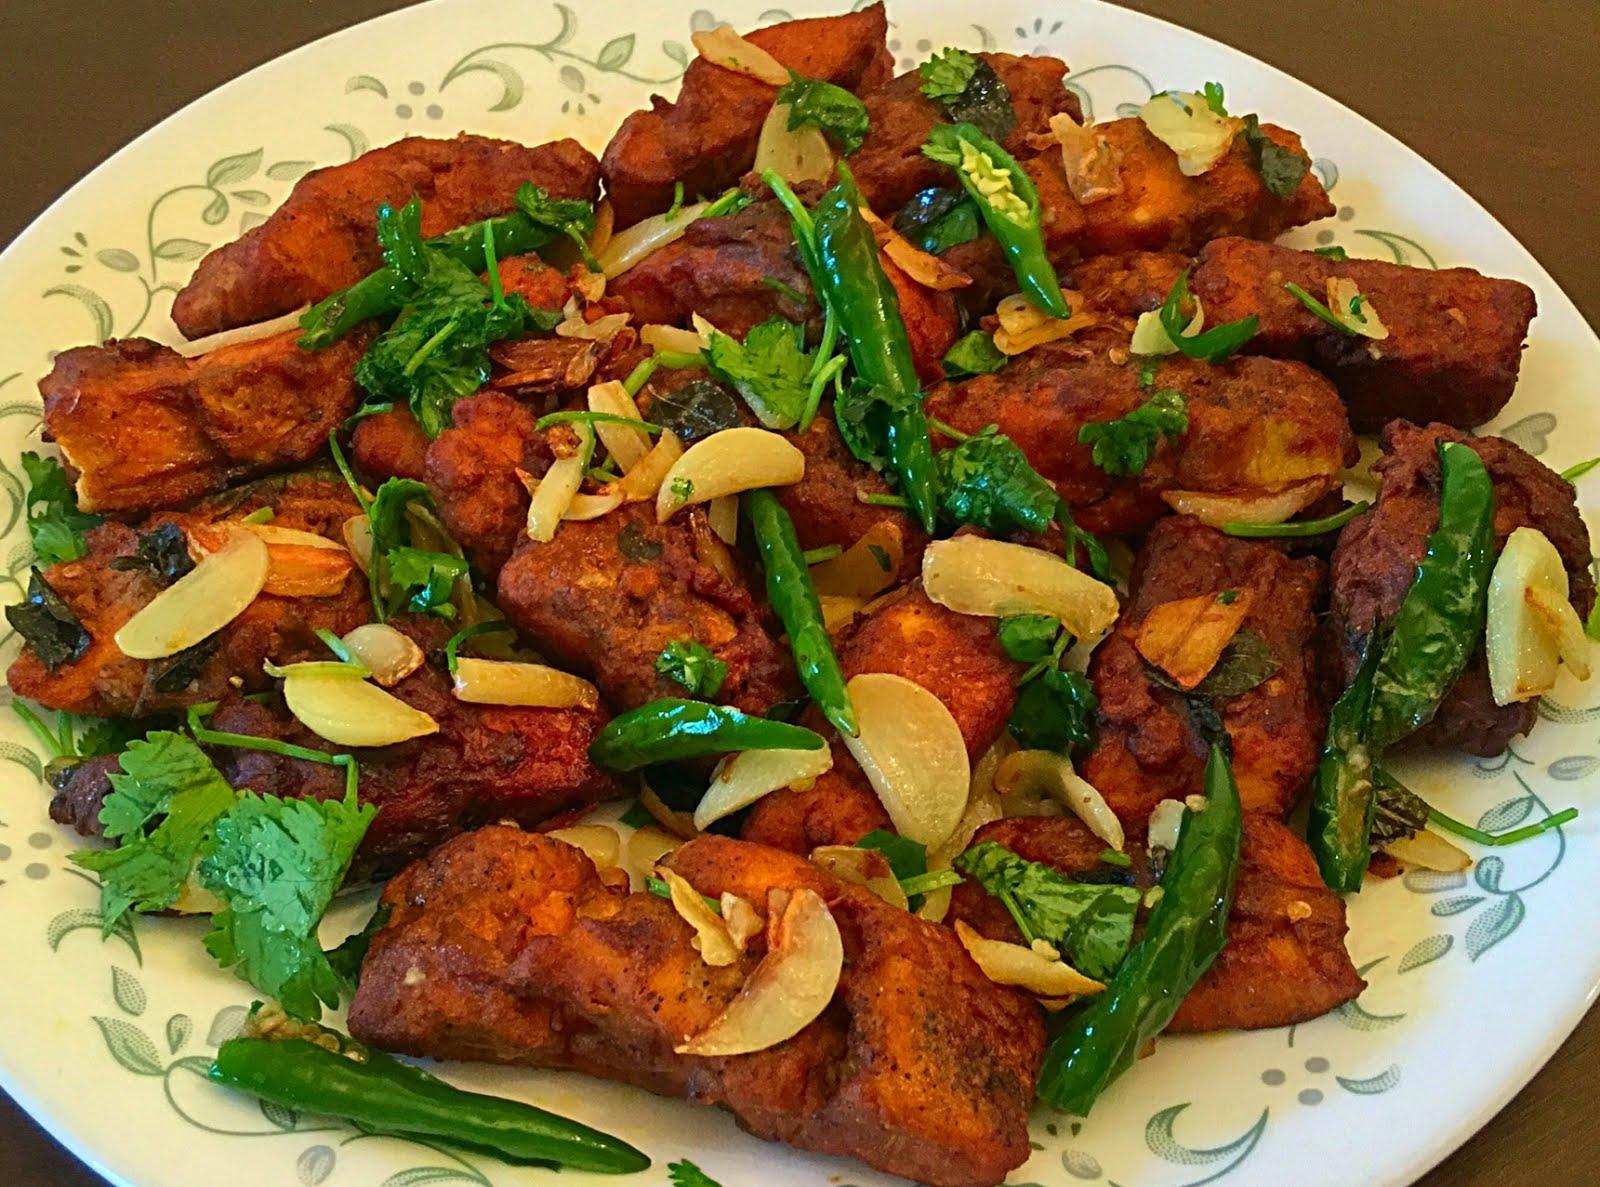 Restaurant Style Apollo Fish Fry